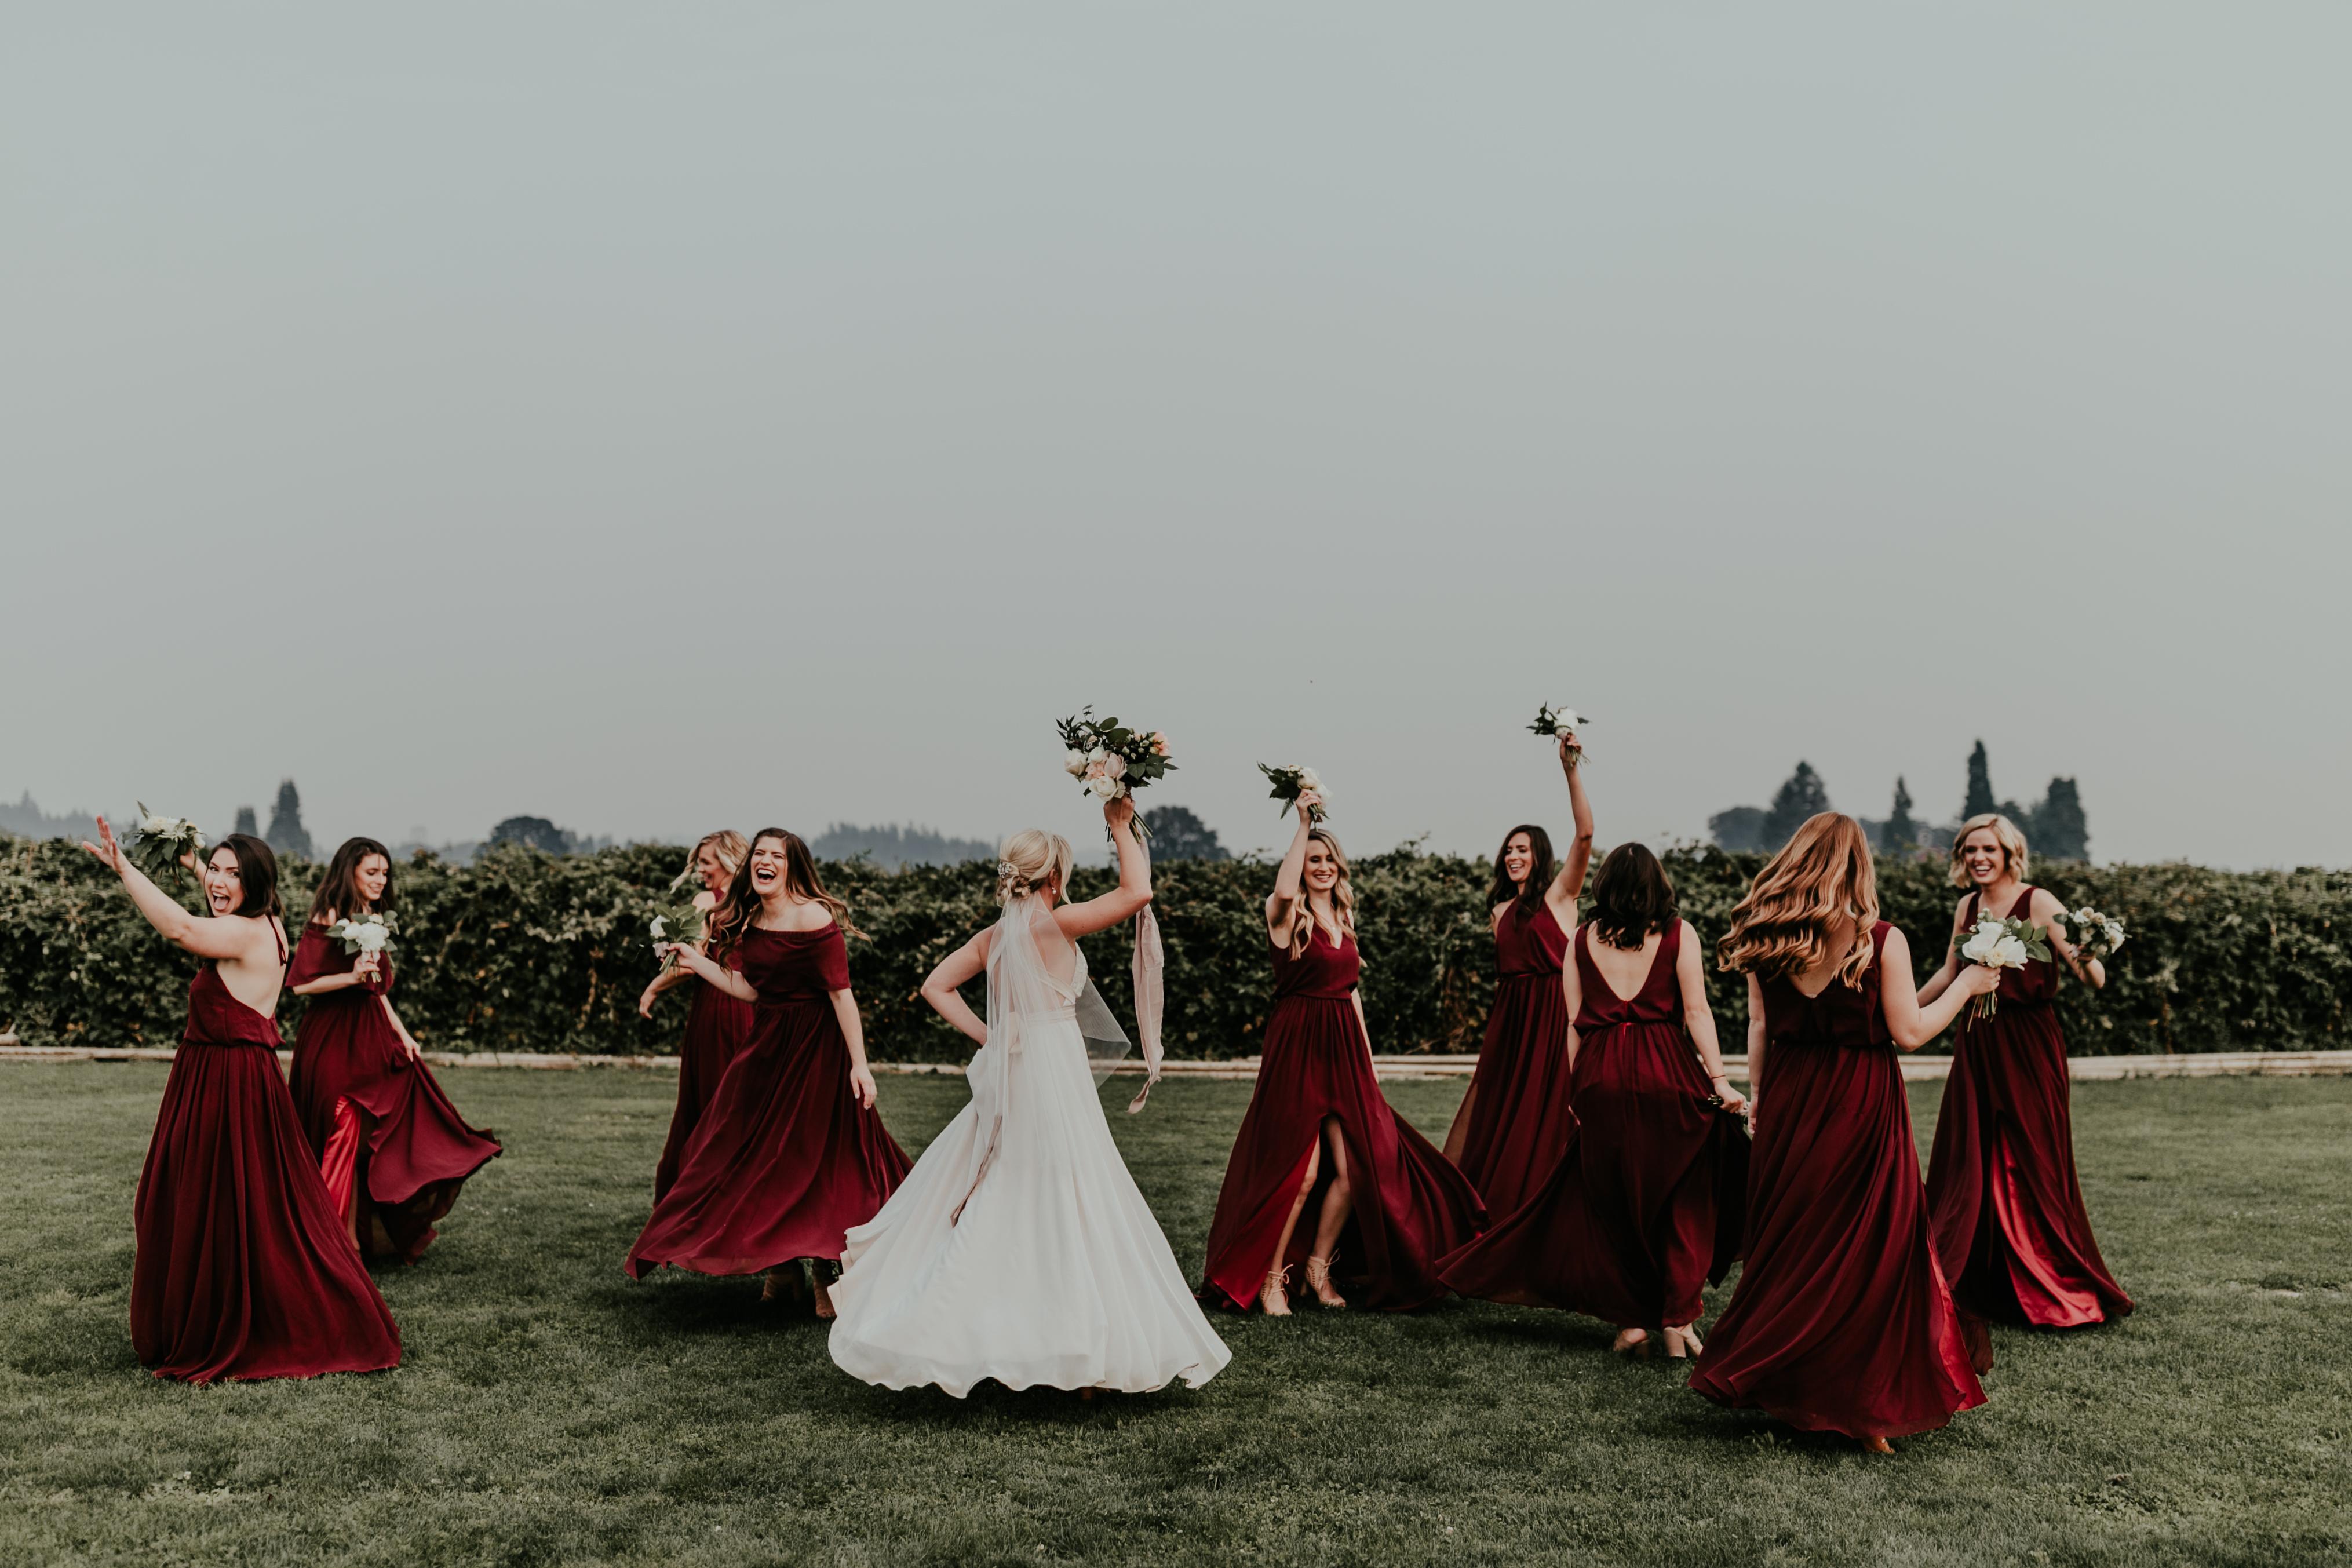 OORDT_WEDDING-222